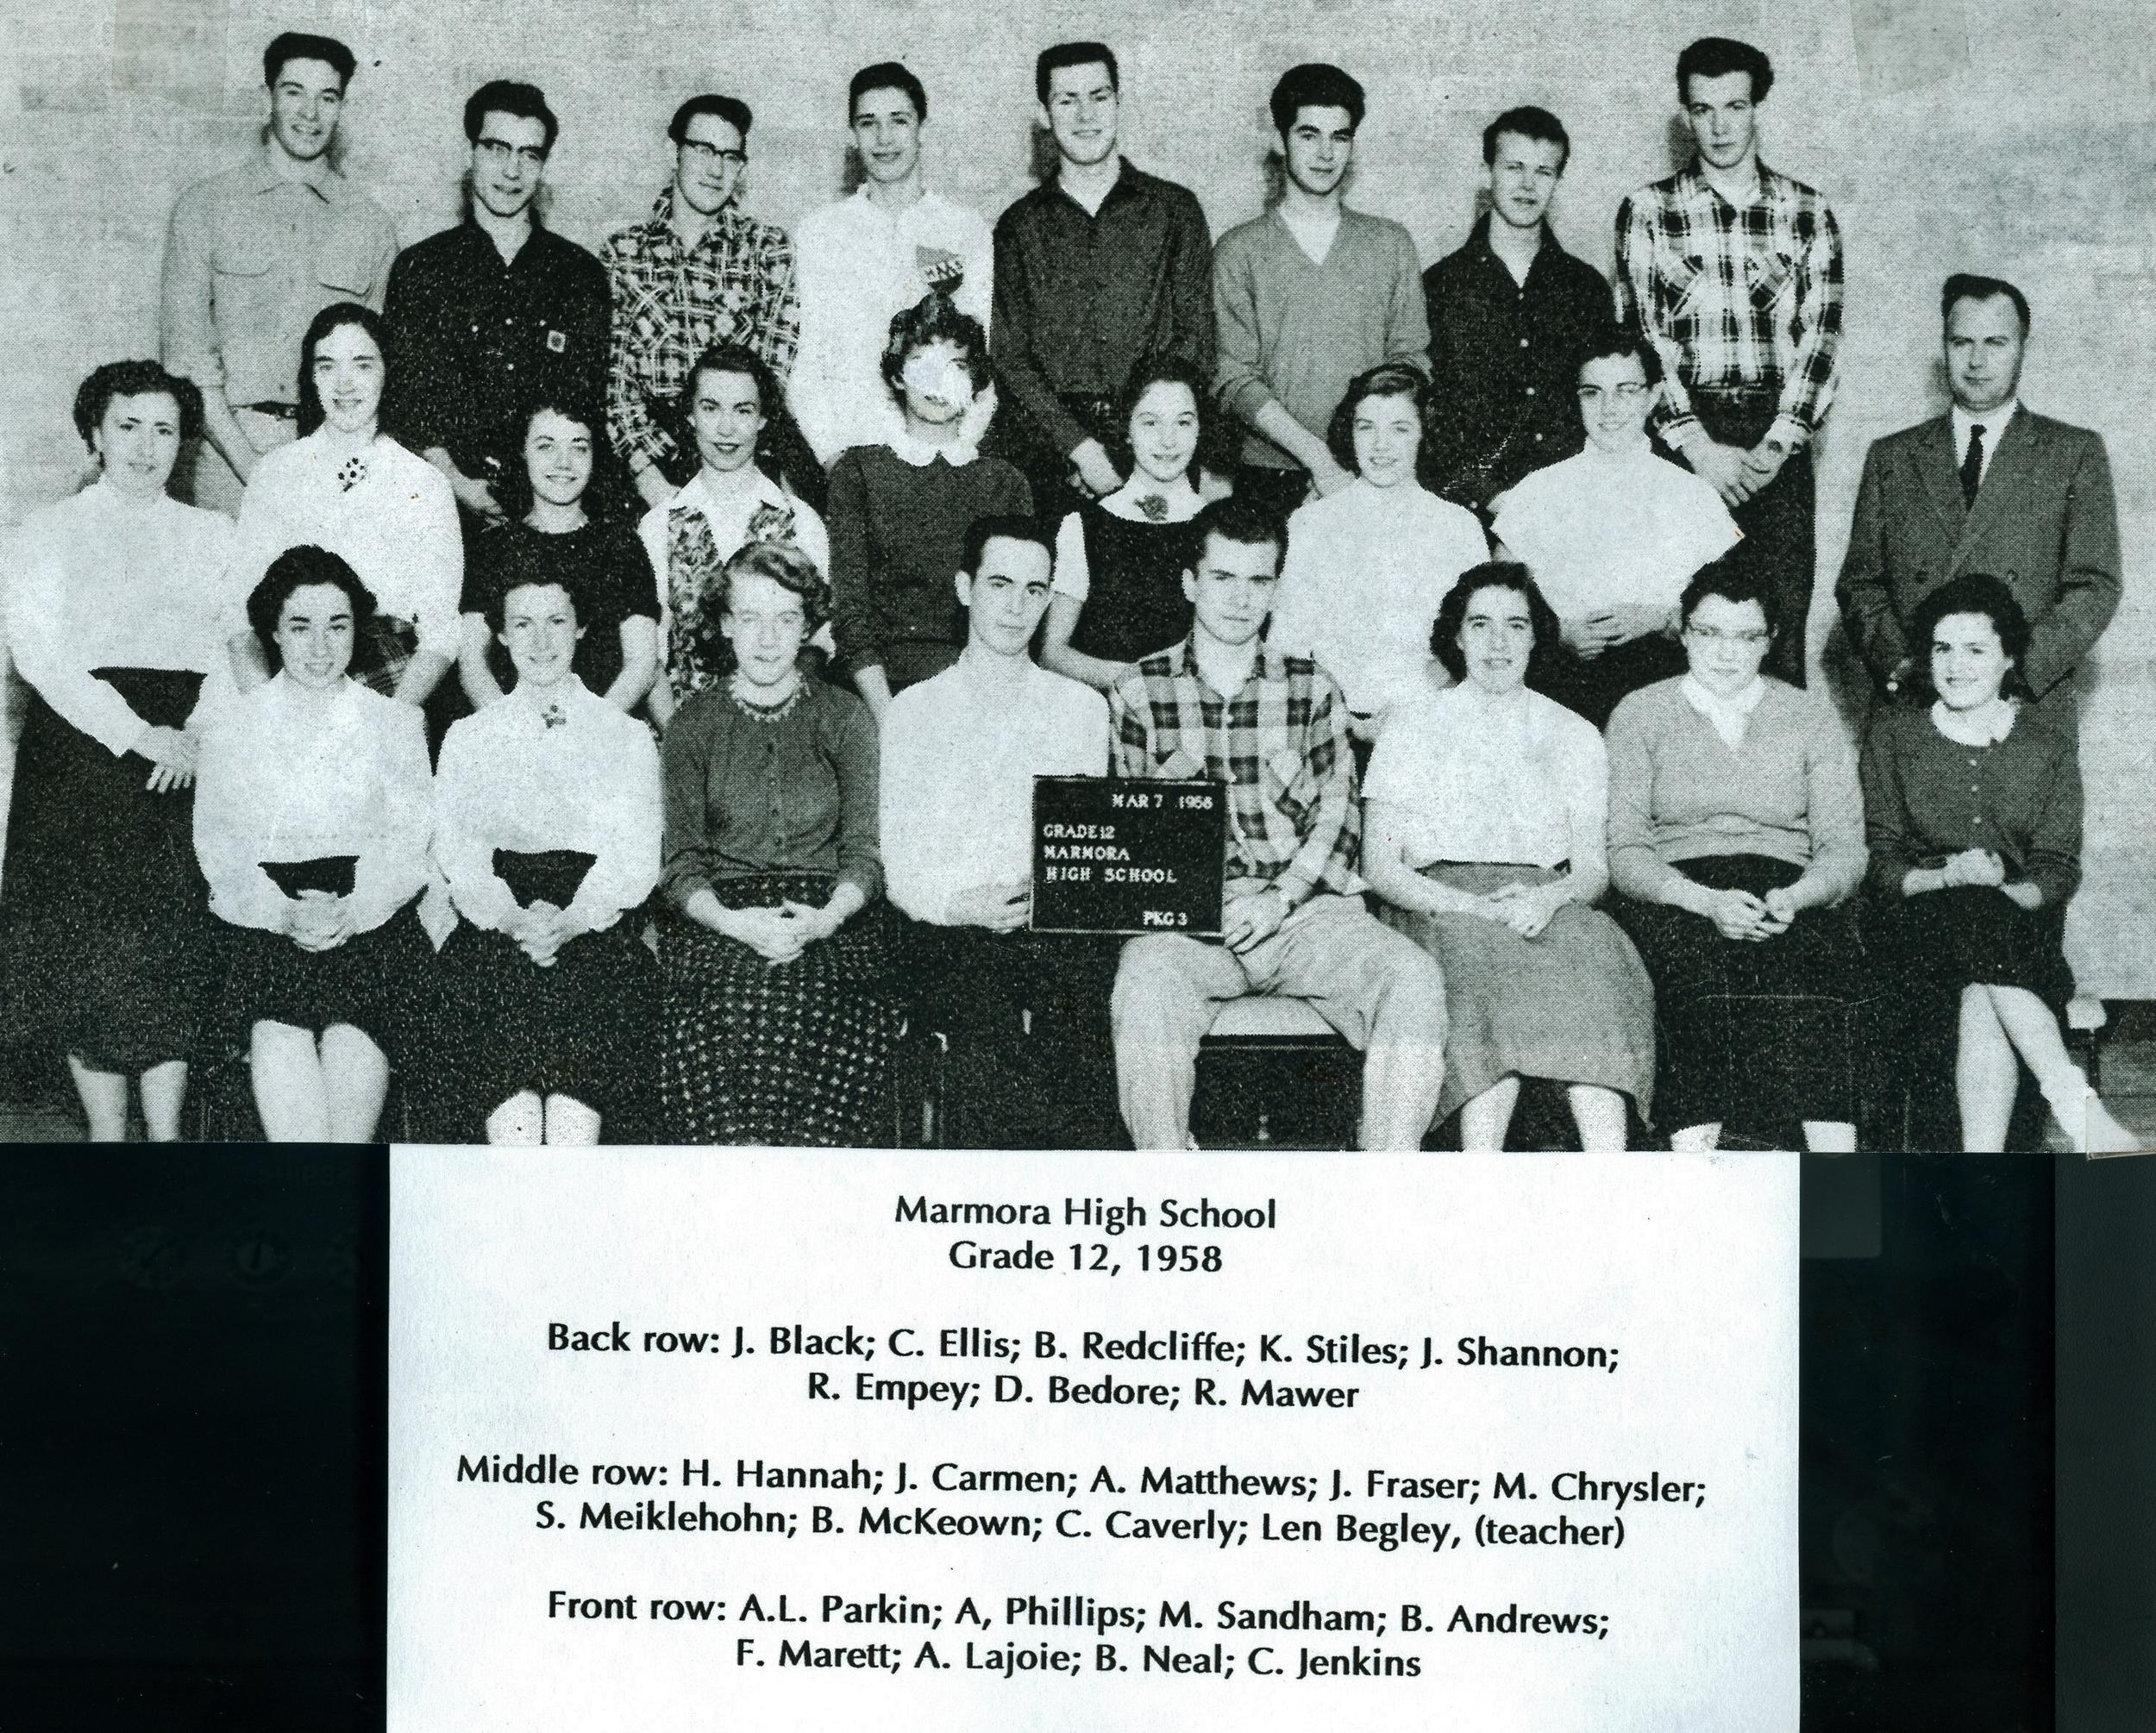 1958 Marmora High School, Gr. 12.jpg